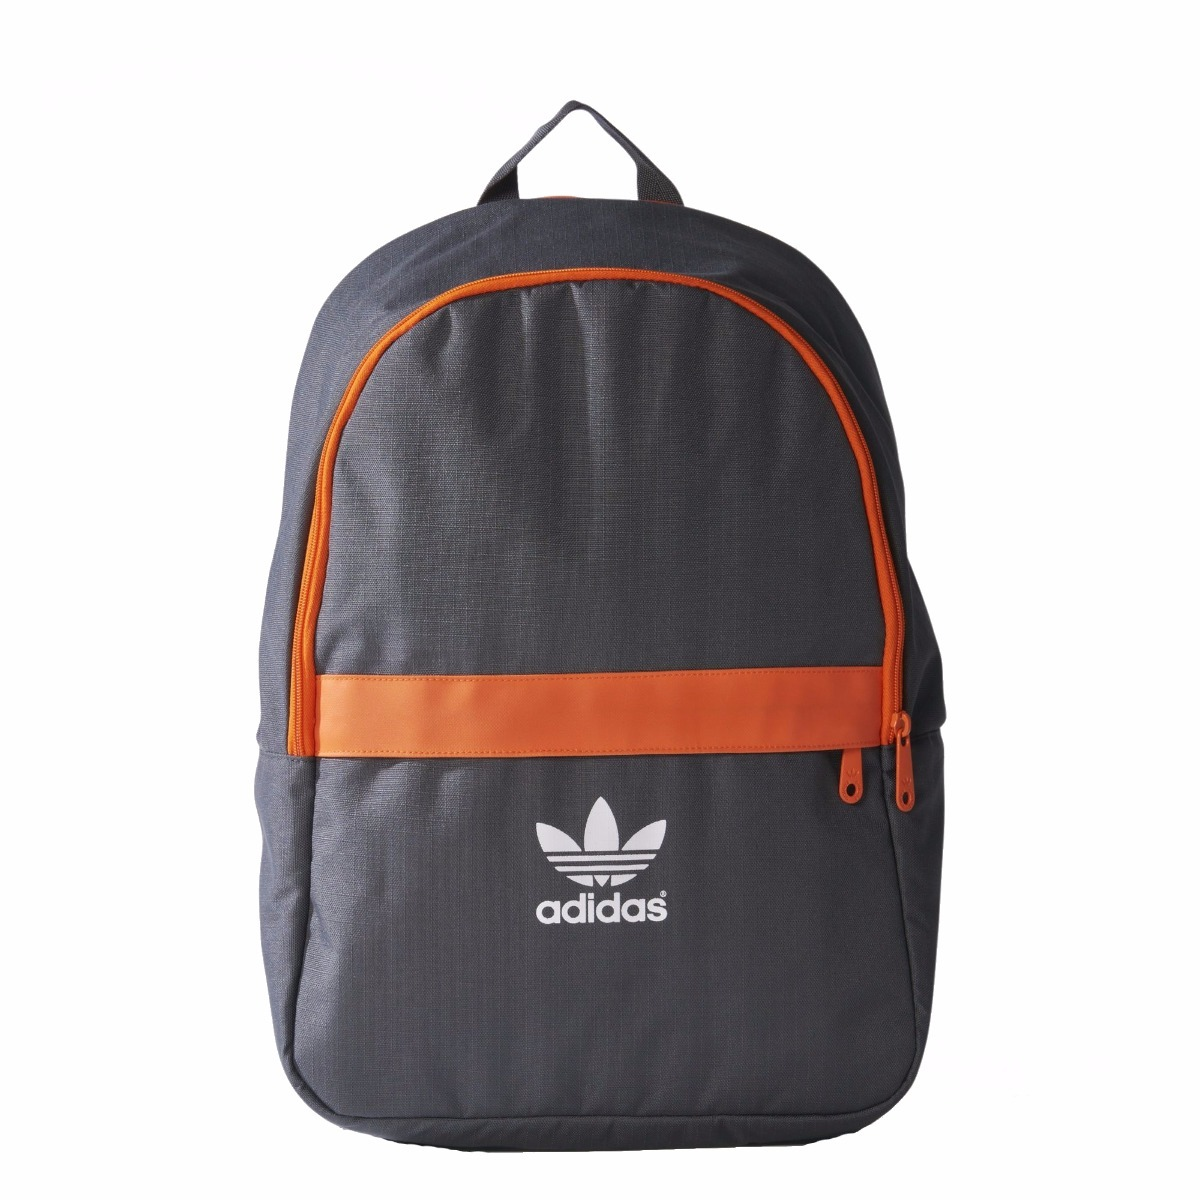 d8486dc72 mochila adidas originals bp essential imperdible! importada. Cargando zoom.